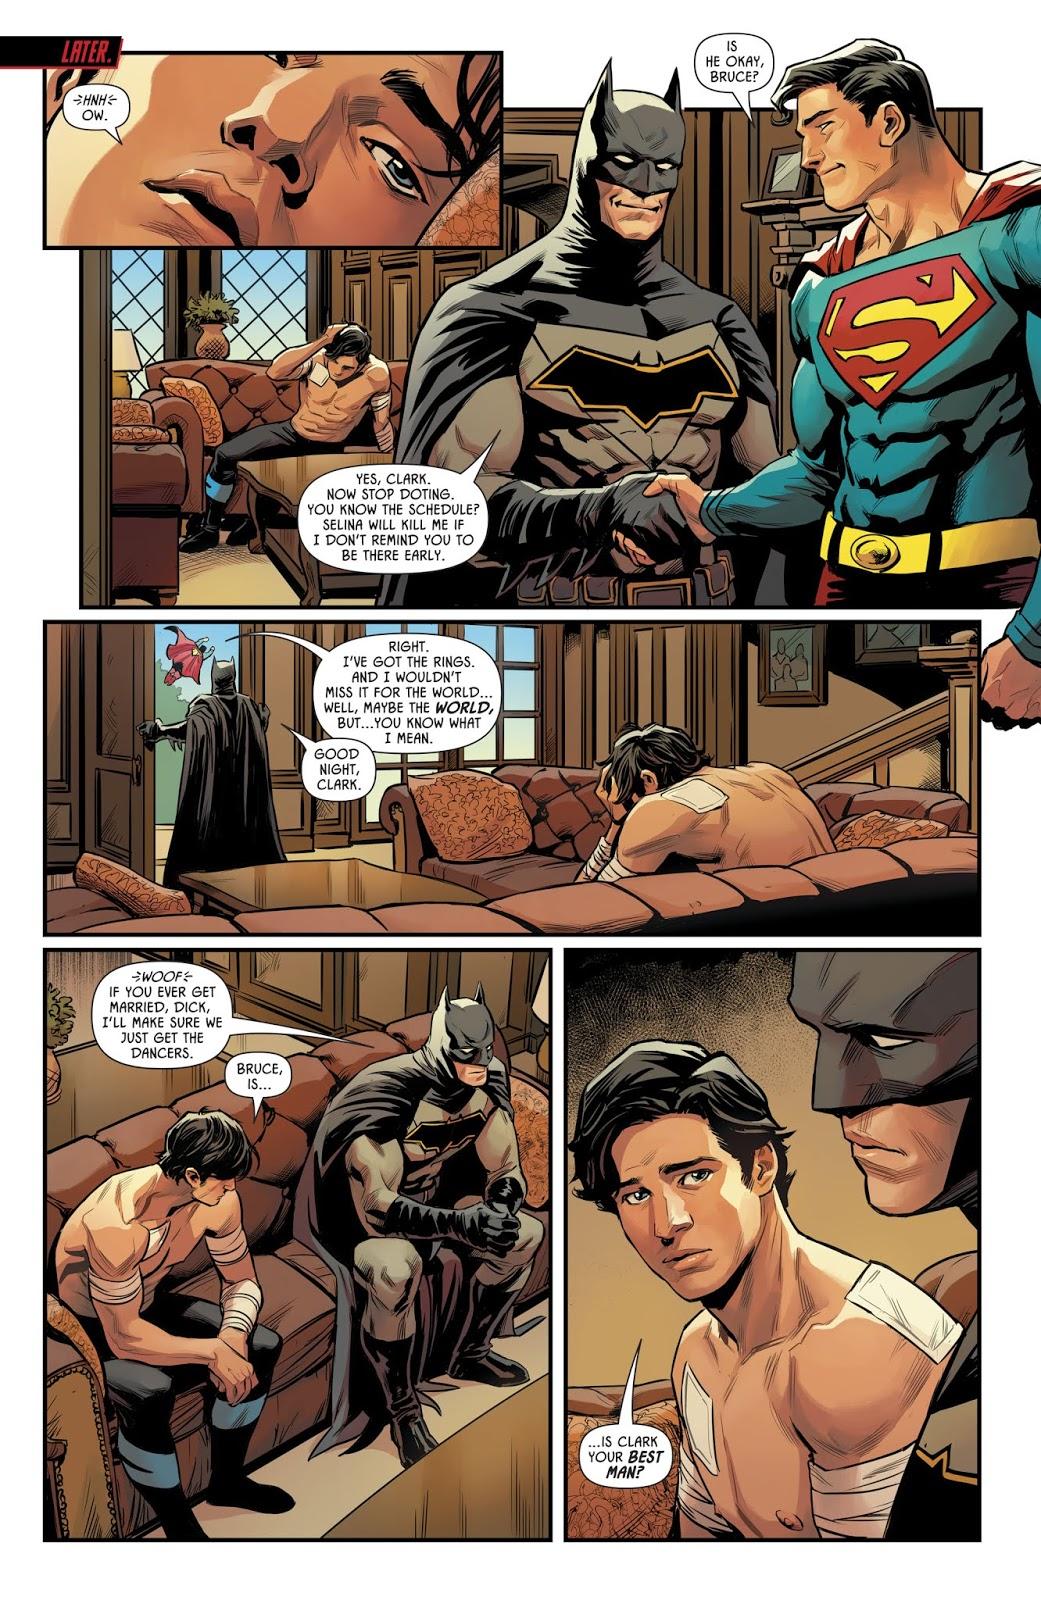 Superman Is Batman's Best Man For The Wedding